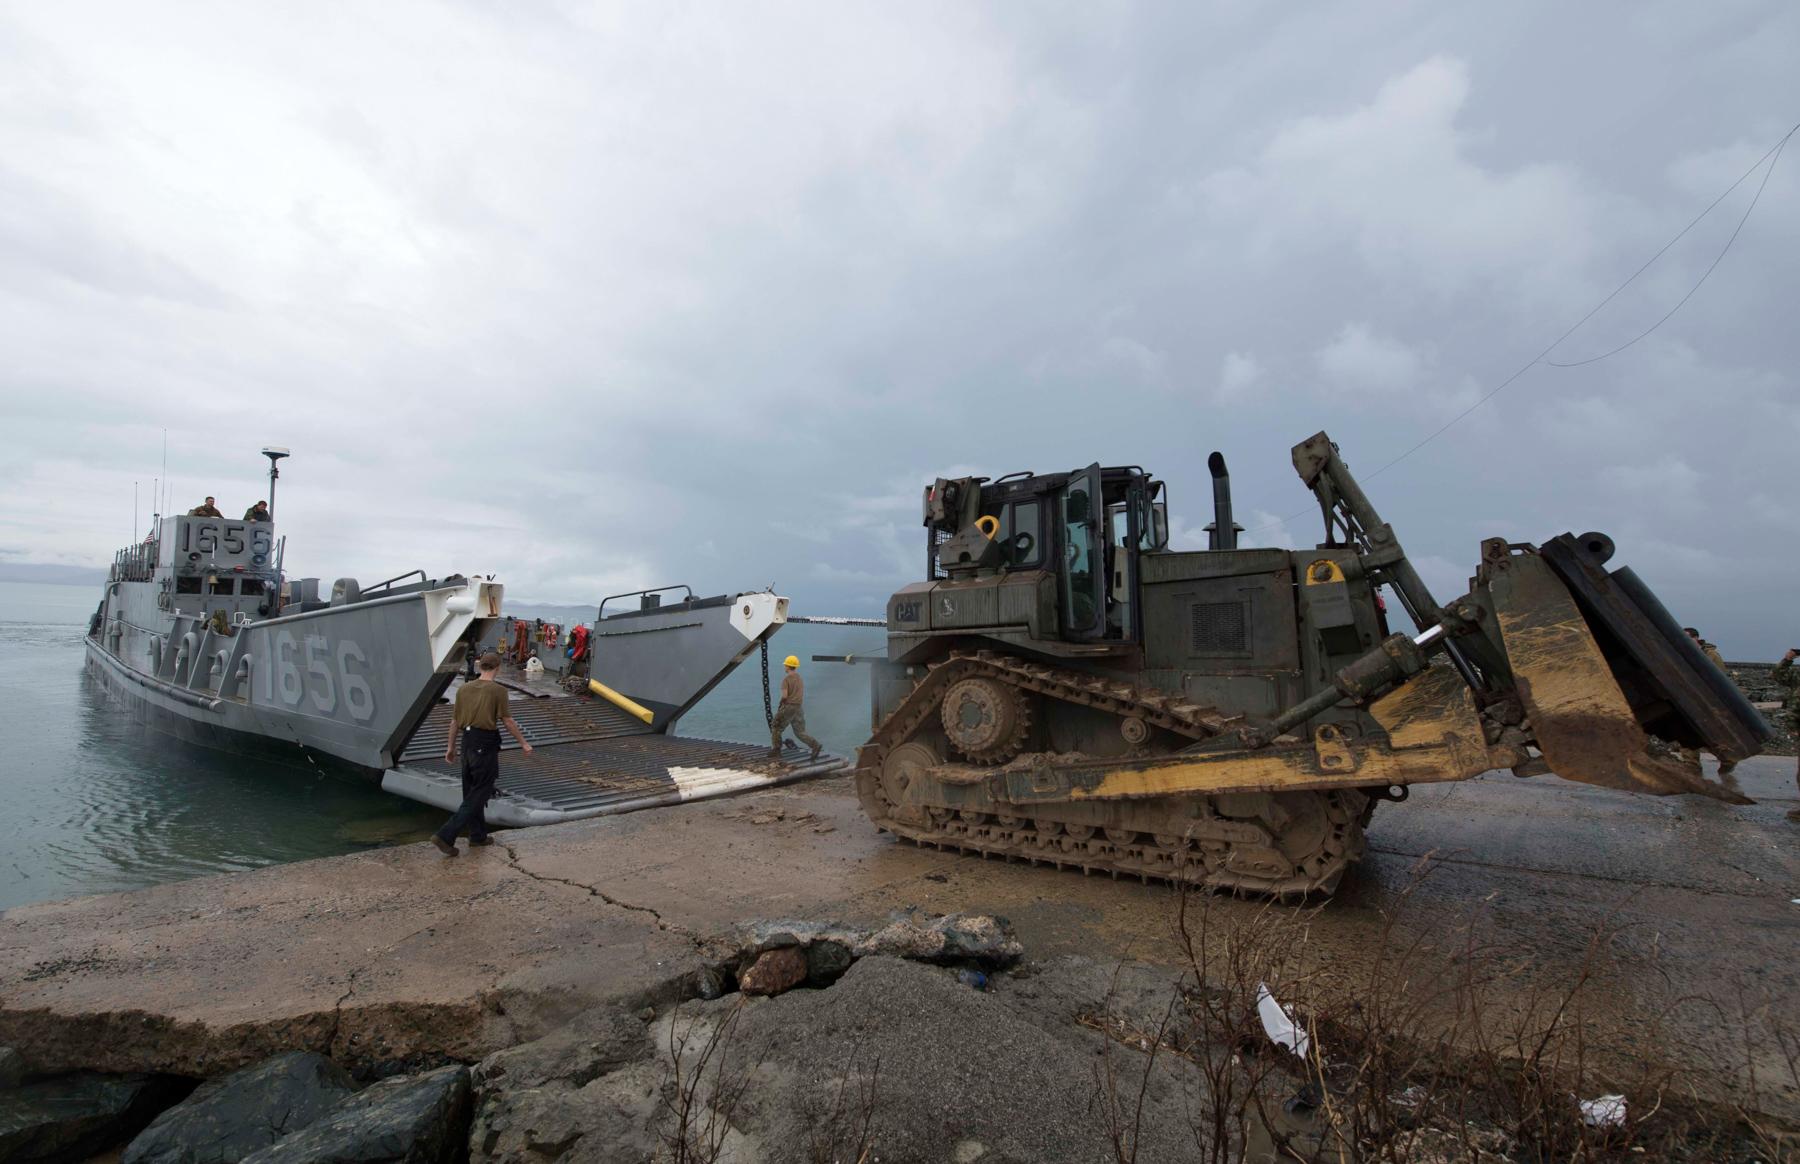 Landing Craft Utility offloading a bulldozer onto concrete pier (U.S. Navy)